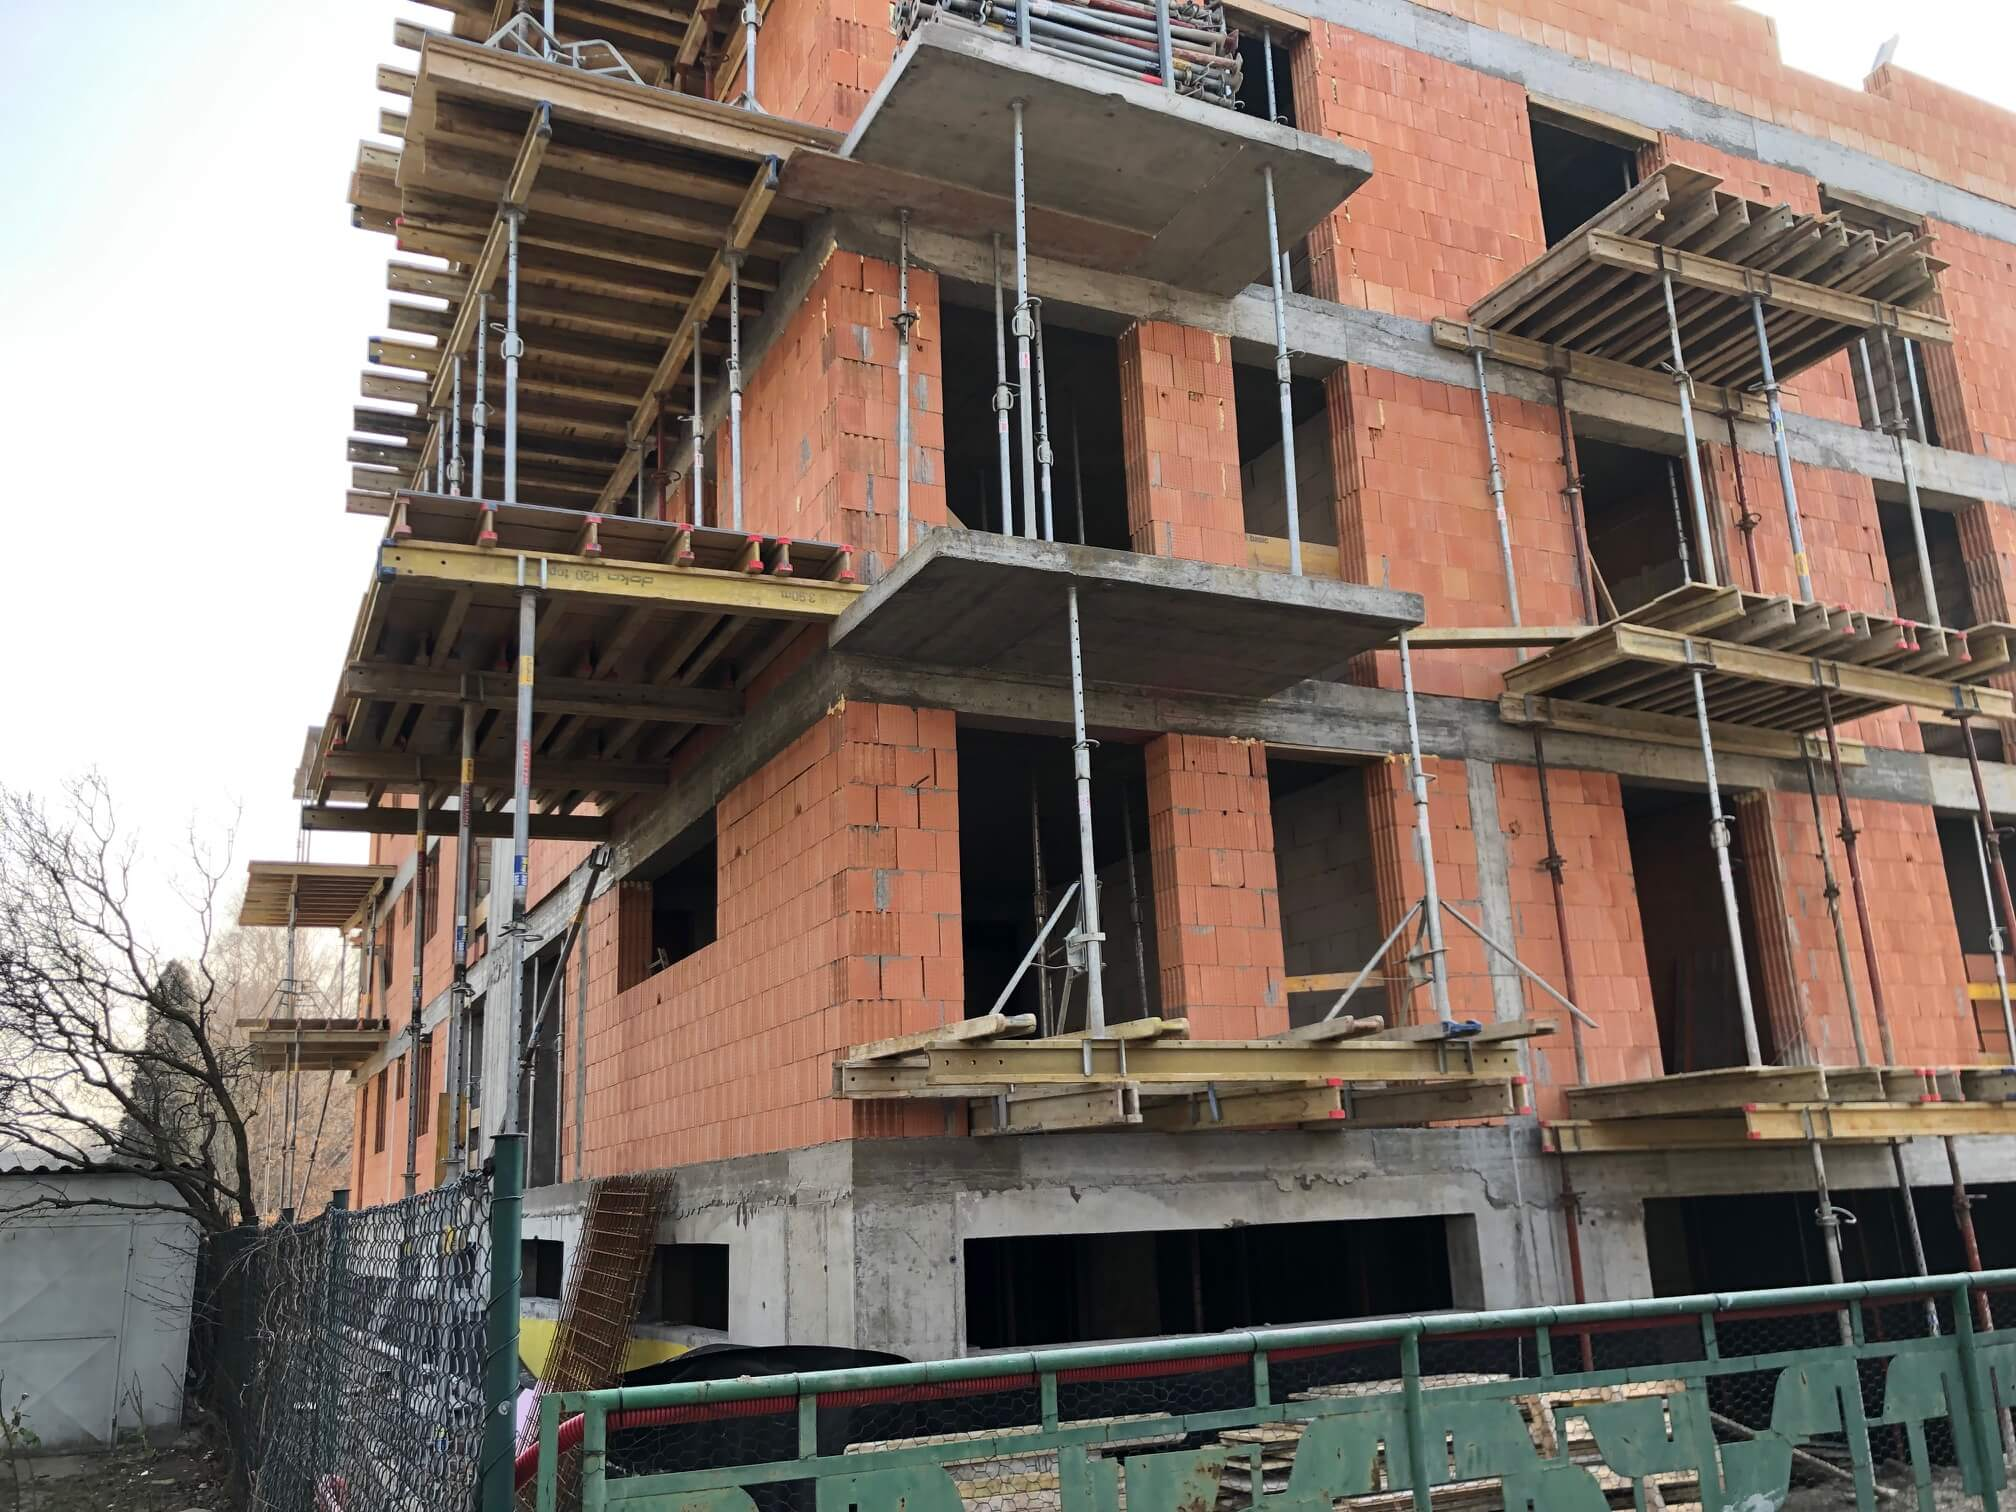 Novostavba 3 Izbový, M-House, Malacky centrum, 70,05m2, Loggia 7,48m2-15